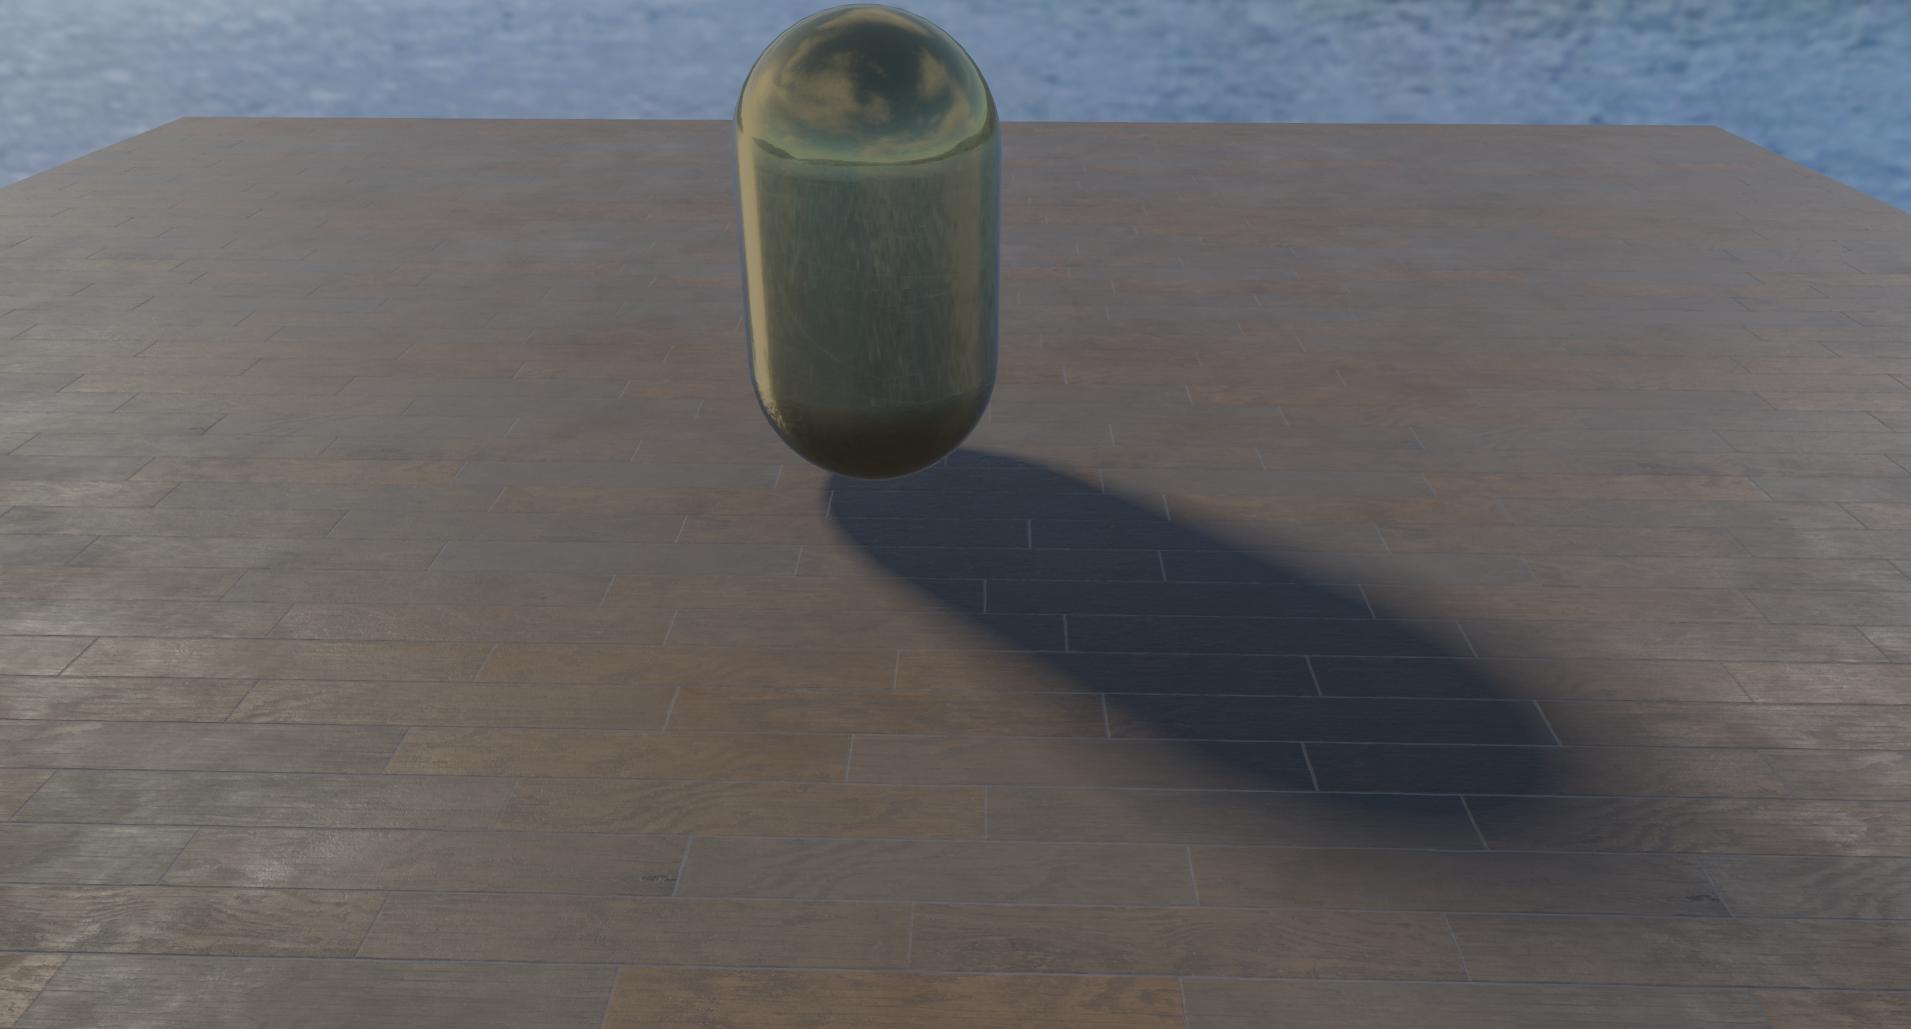 CapsuleShadow